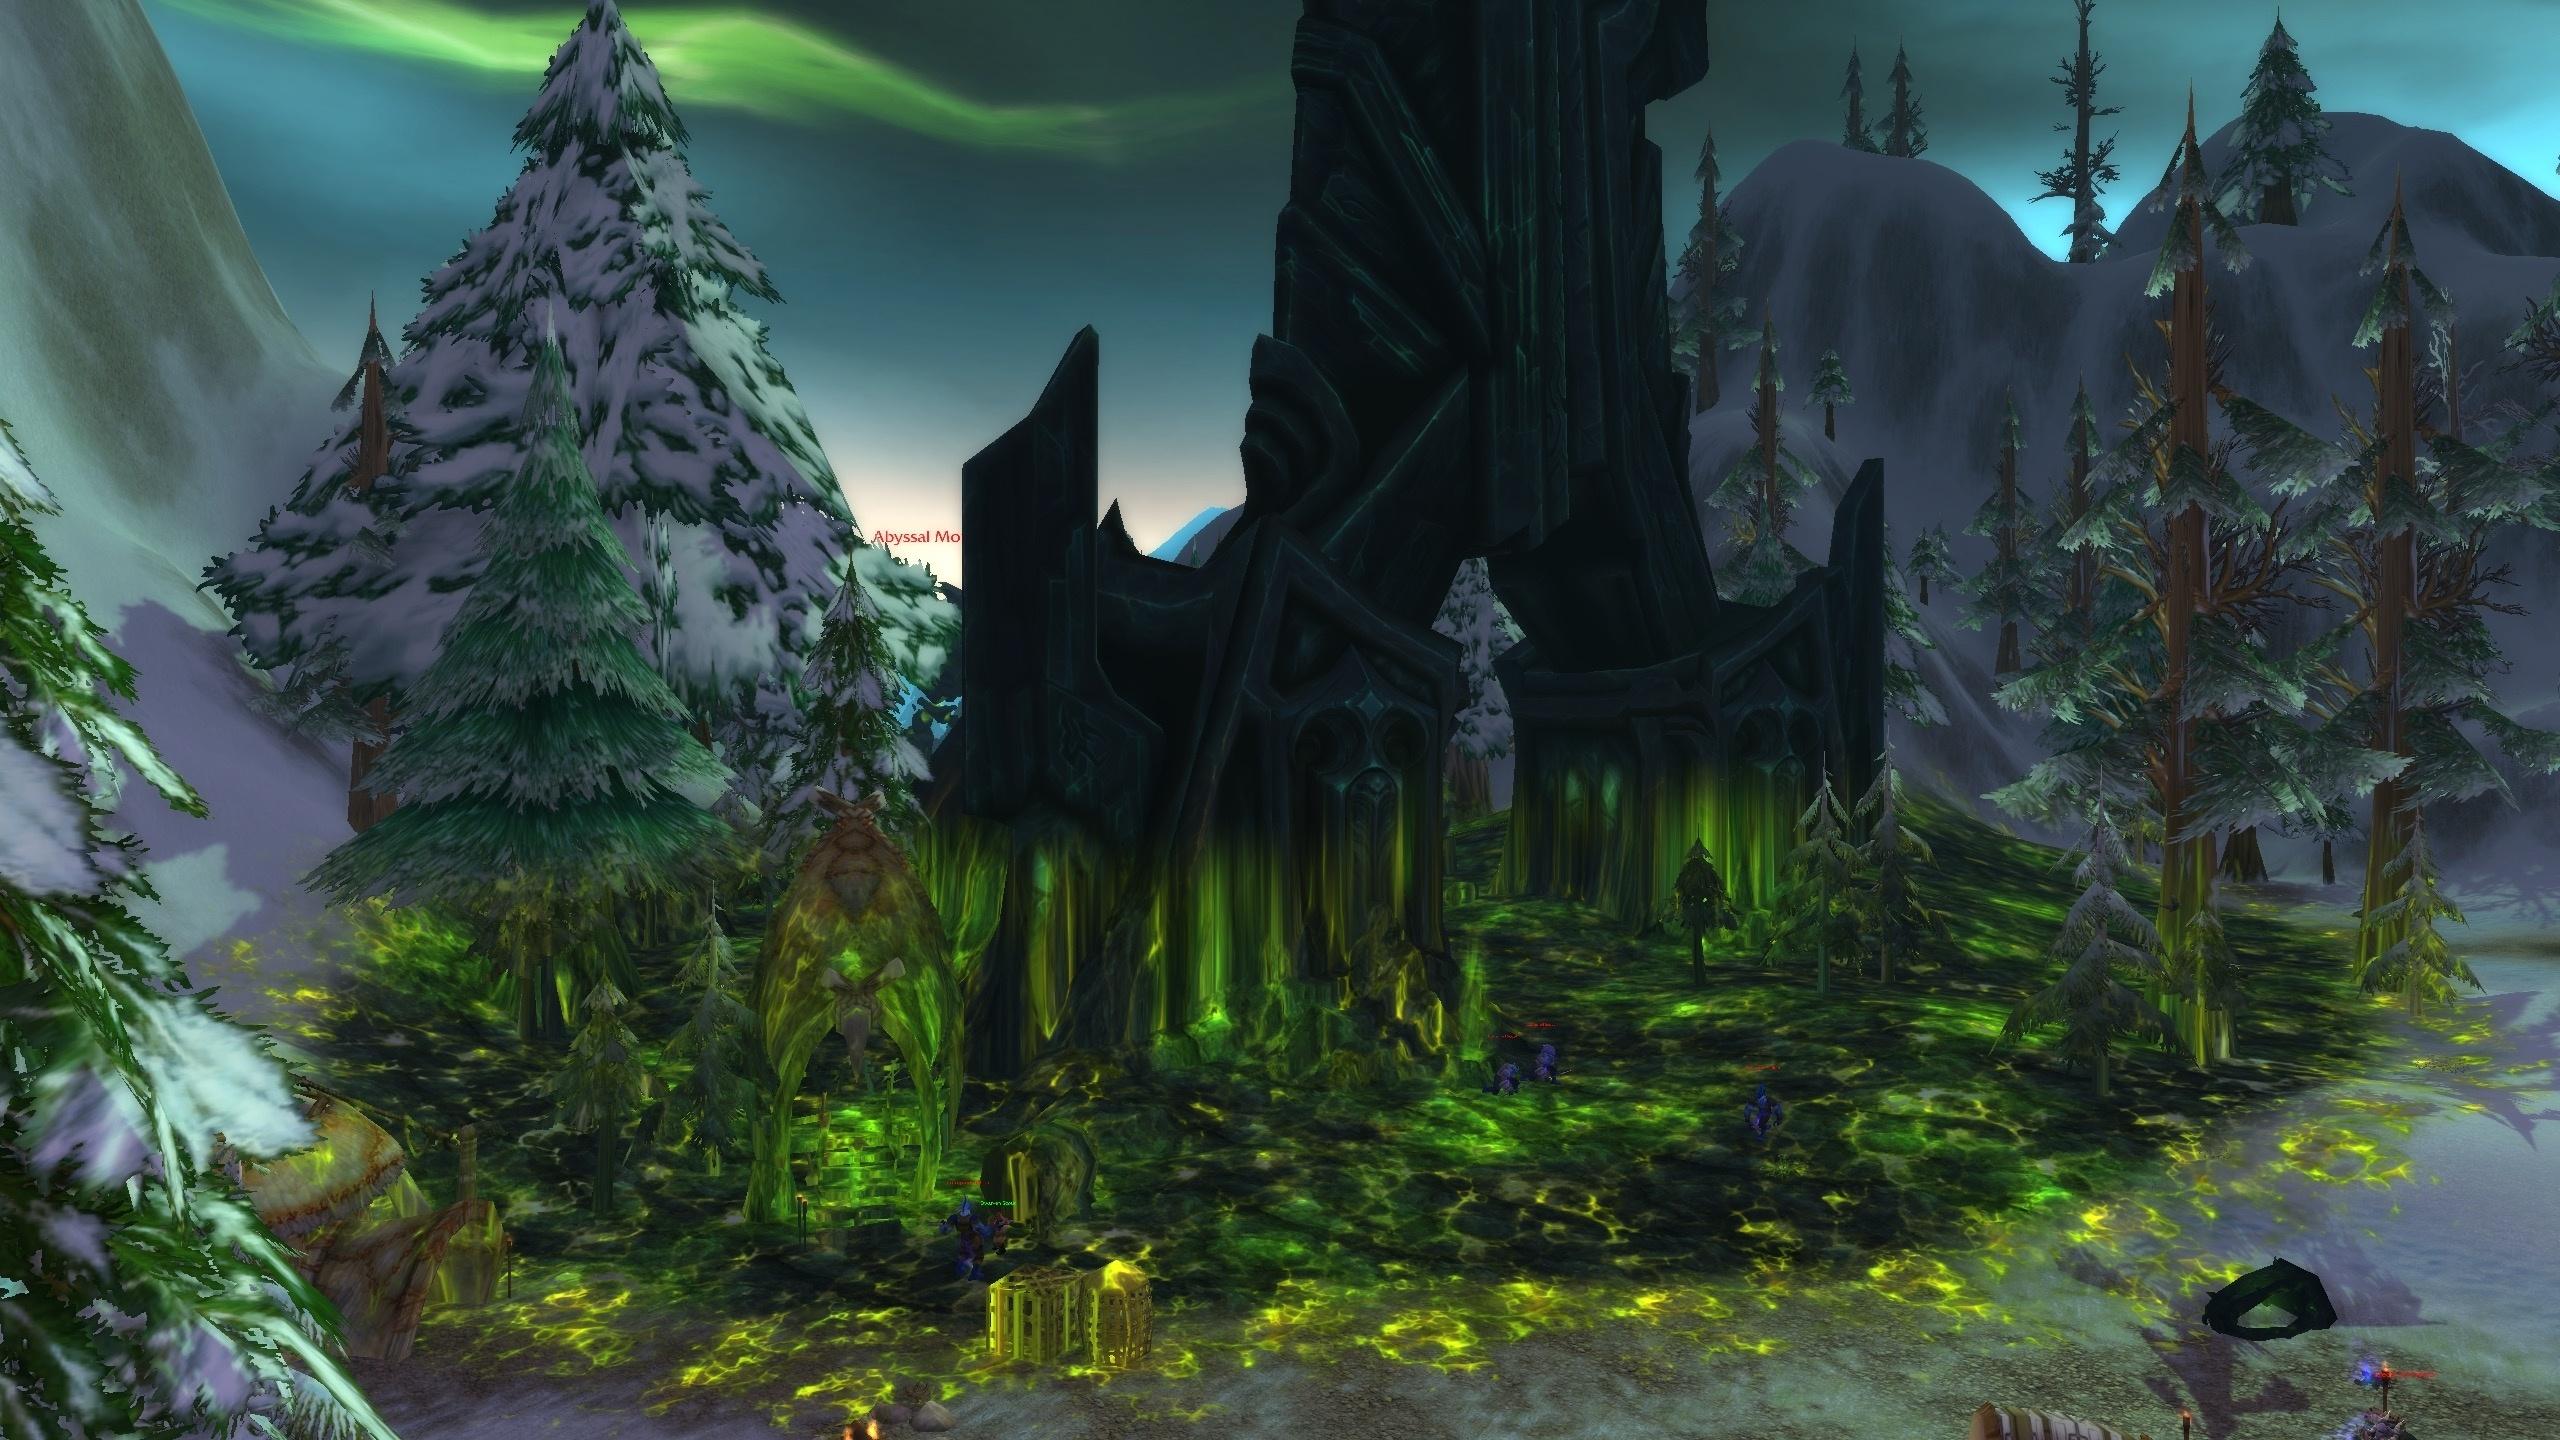 World of warcraft: 'return to karazhan' patch notes revealed.